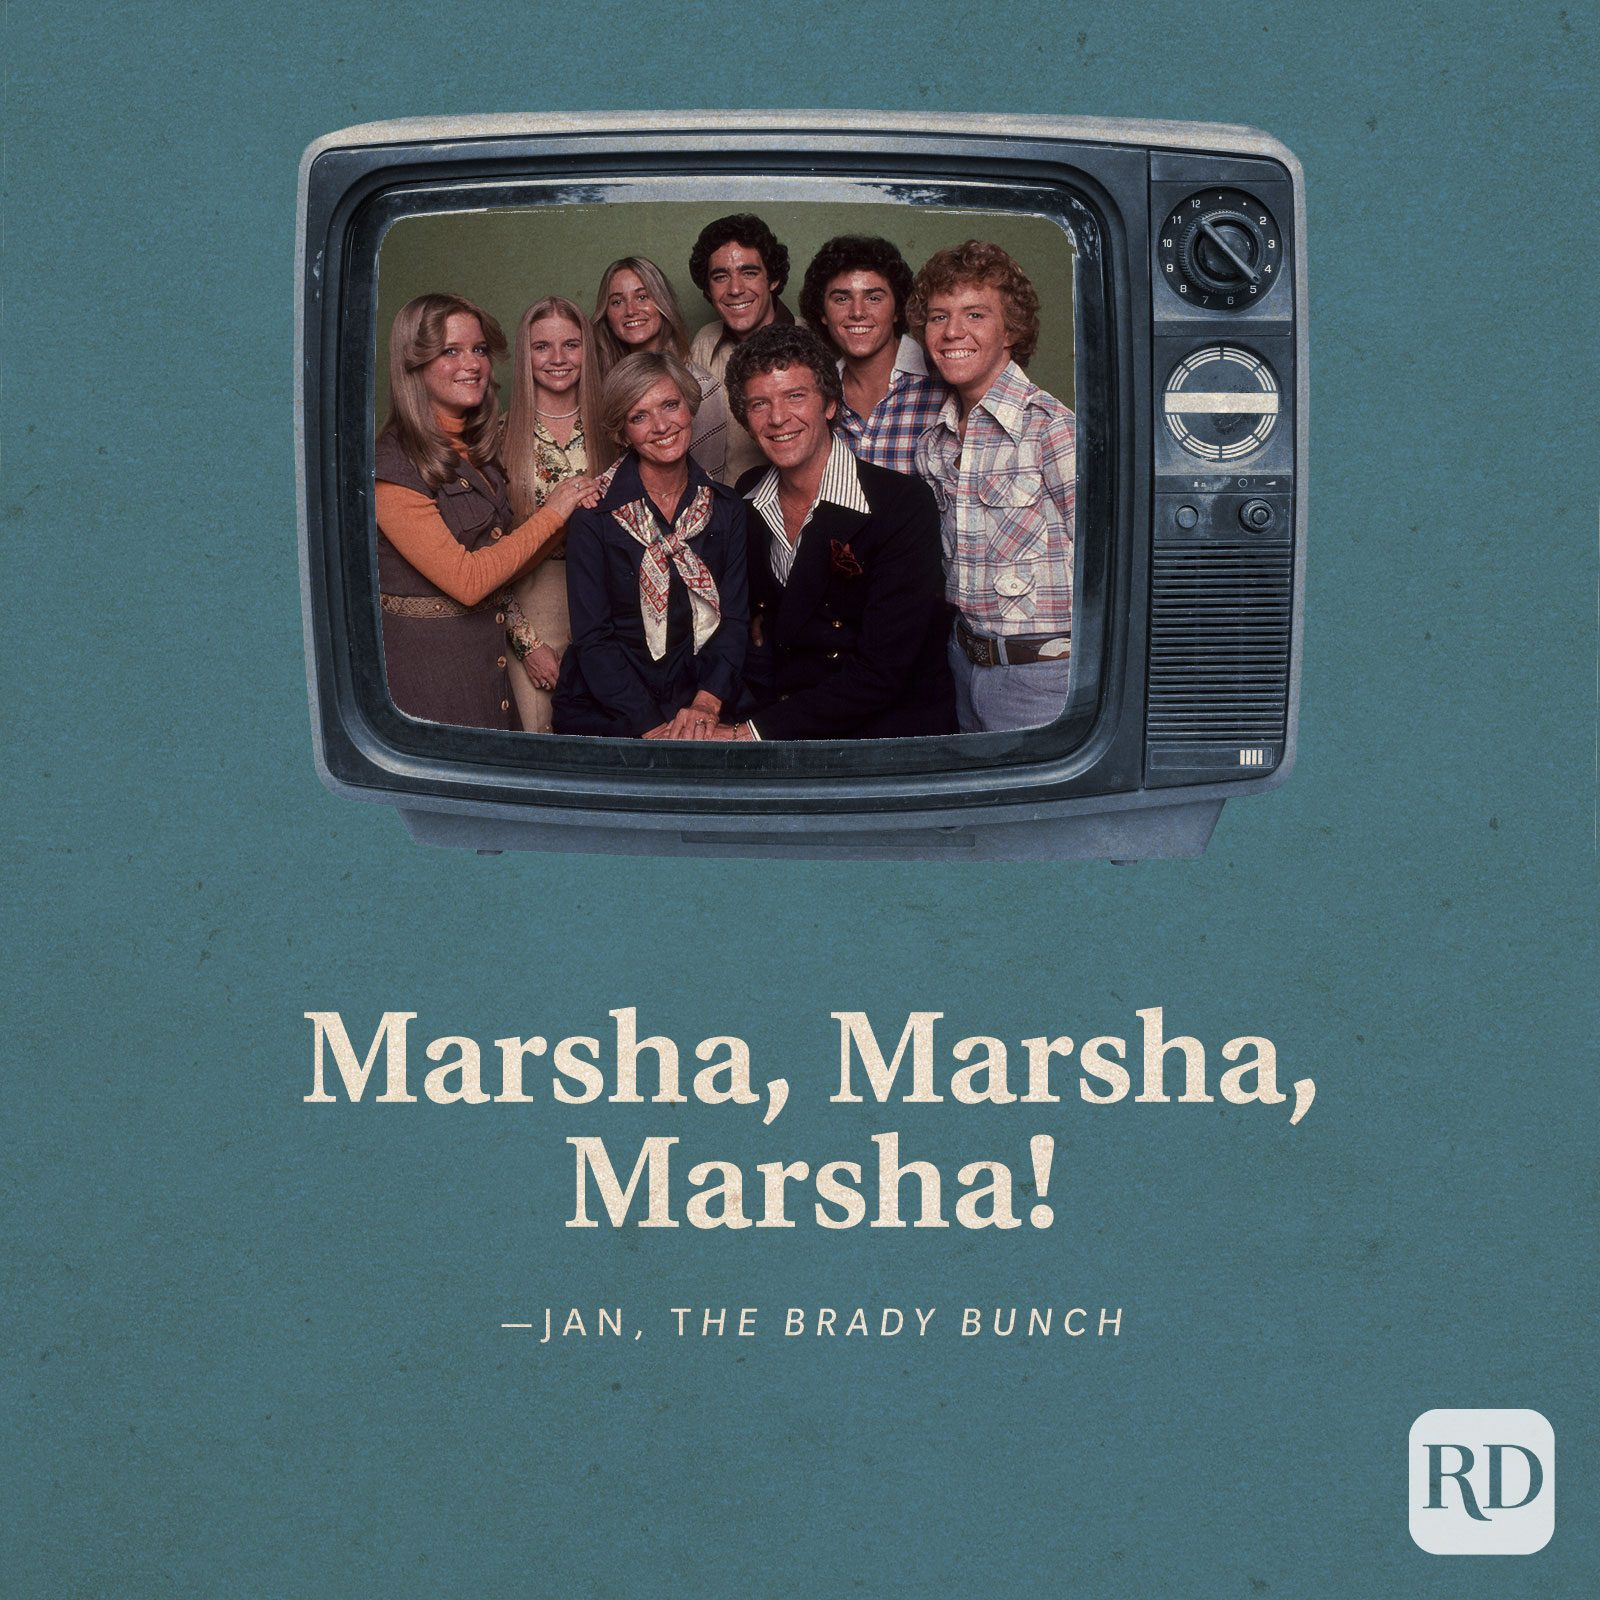 """Marsha, Marsha, Marsha!"" —Jan in The Brady Bunch."